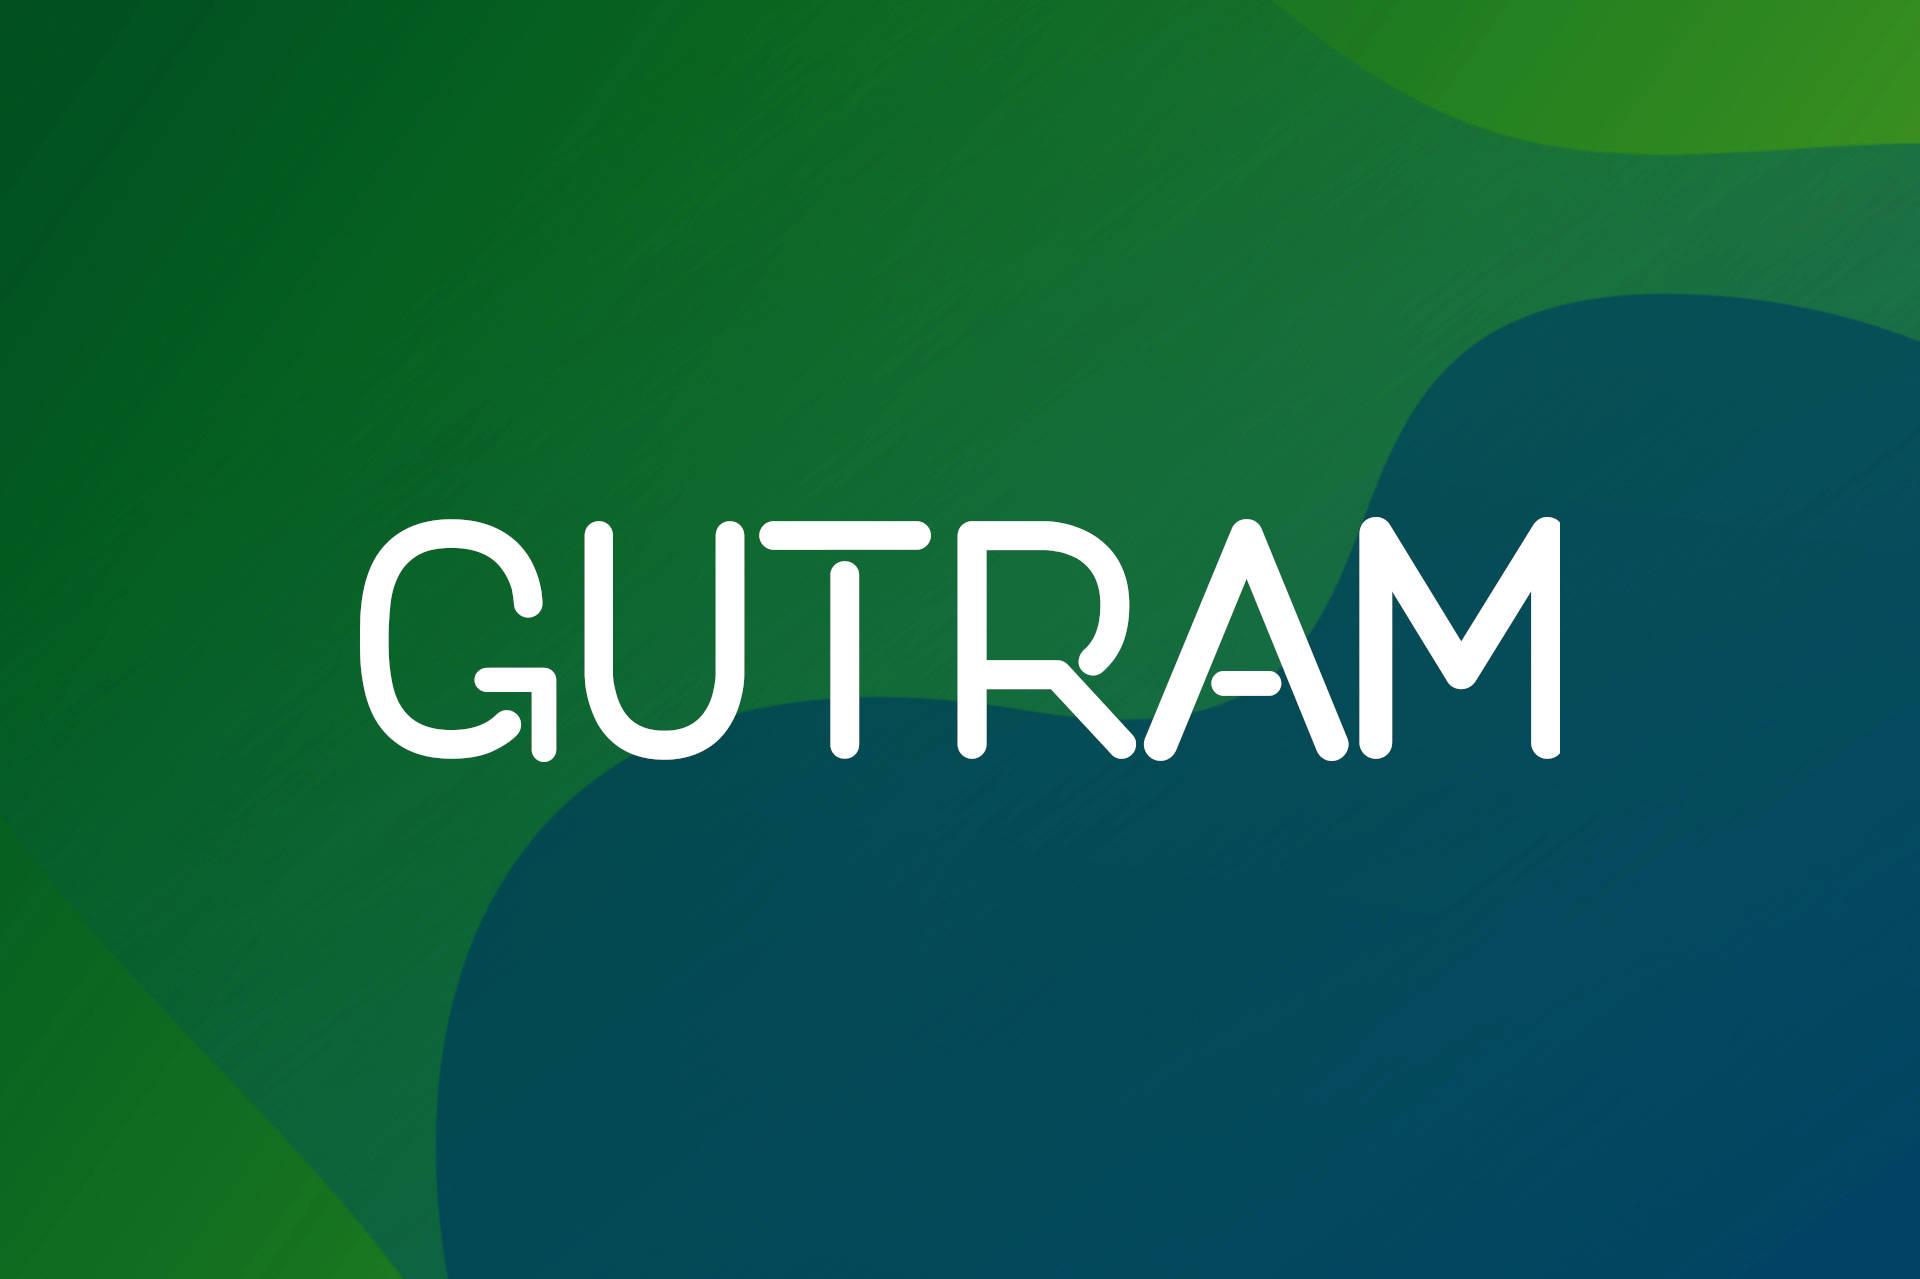 Becas Prácticas profesionales remuneradas en Gutram con Fundación Novia Salcedo